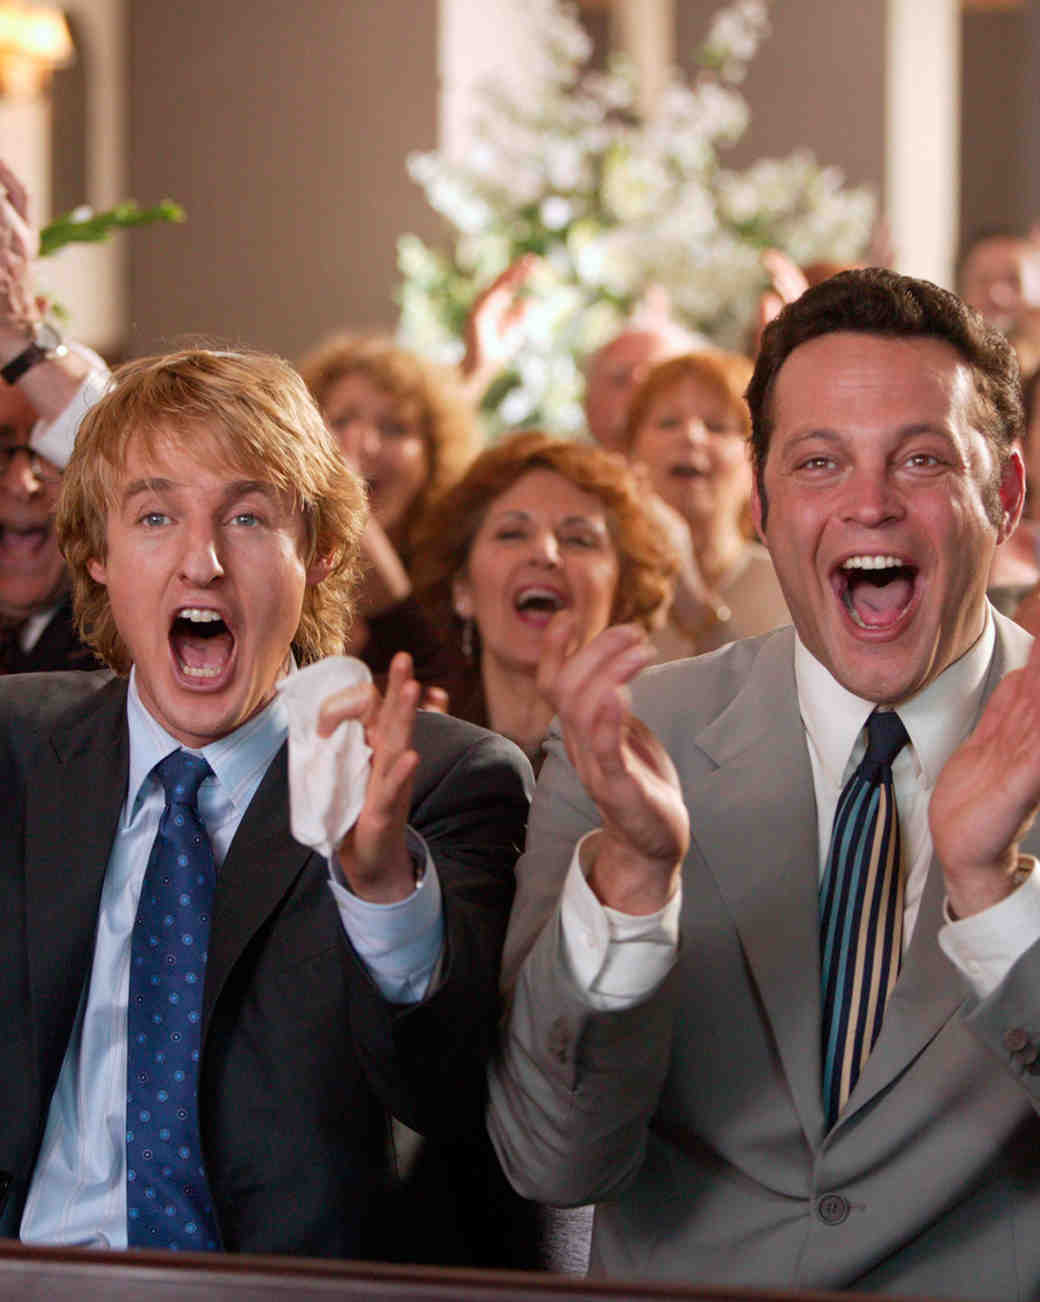 things-guests-should-never-do-wedding-crashers-luke-wilson-vince-vaughn-1015.jpg